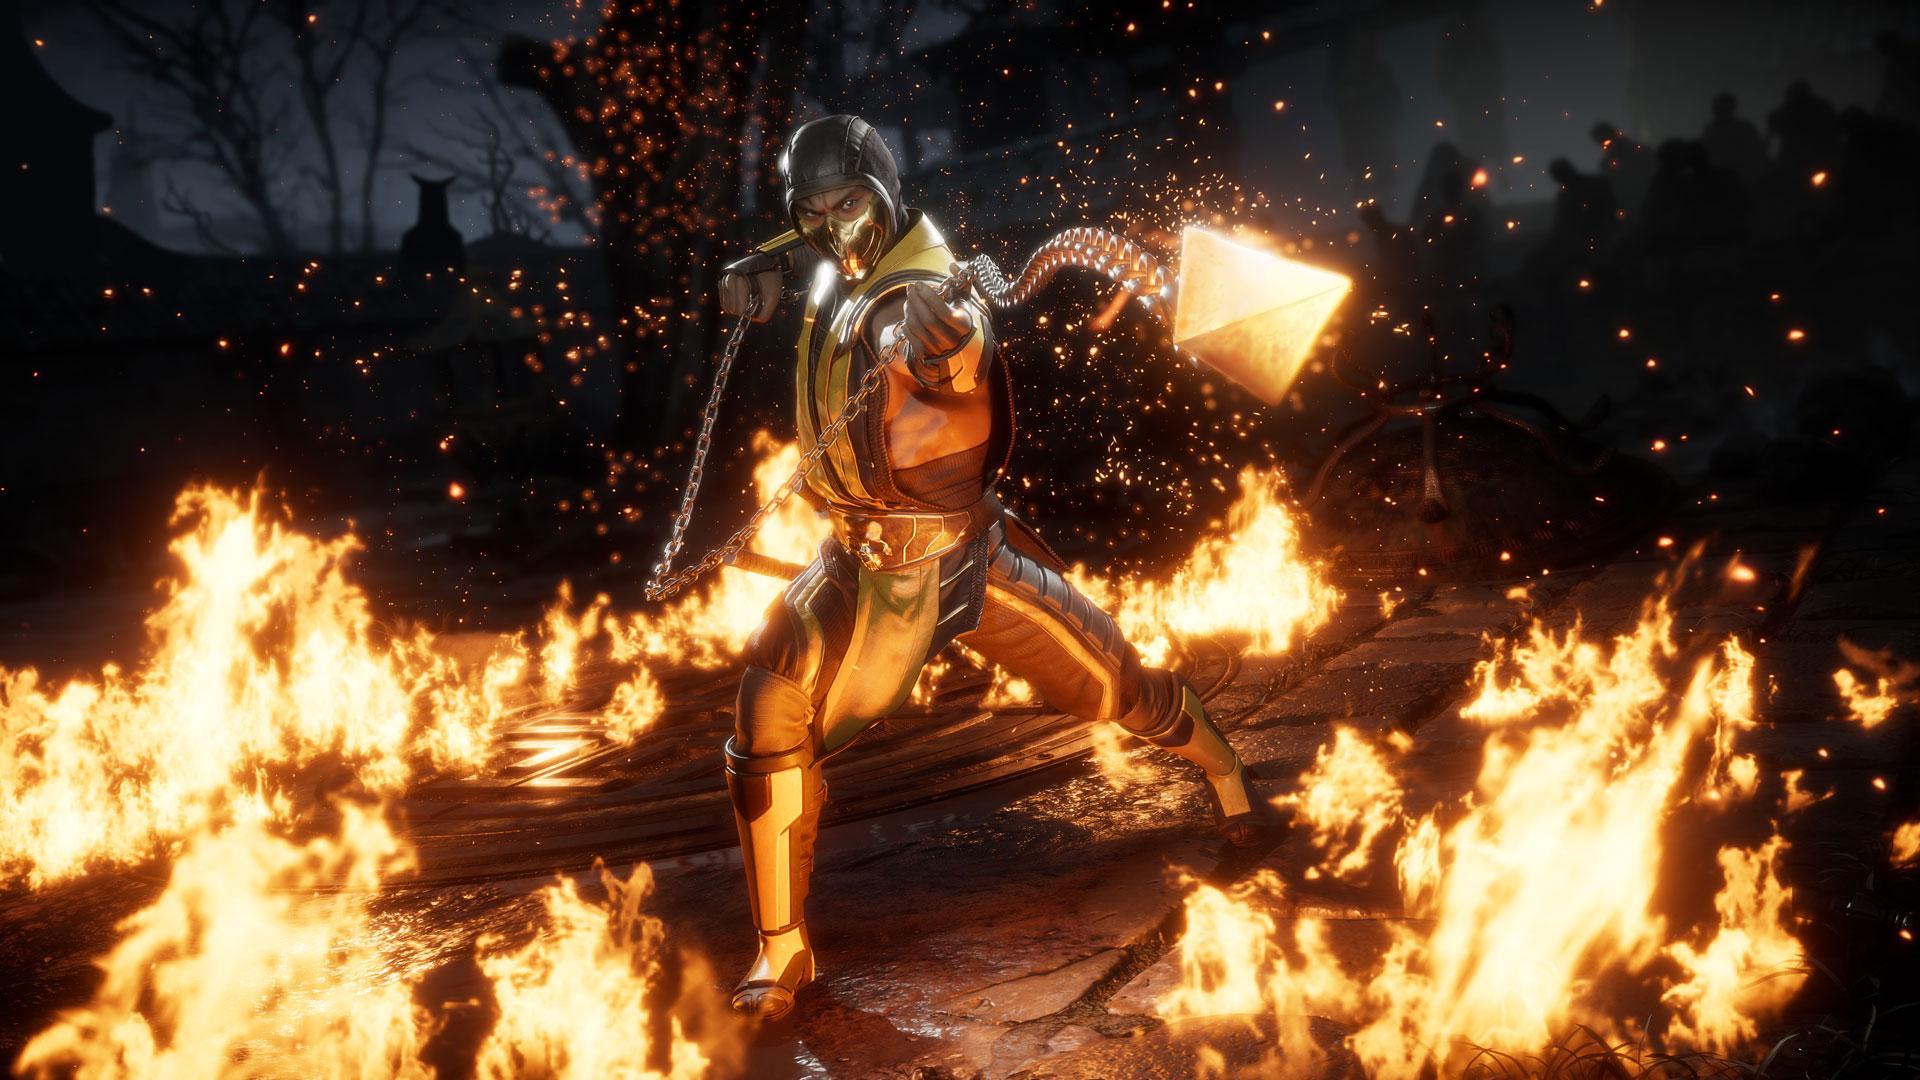 First Screenshots for Mortal Kombat 11 Have Arrived 1920x1080